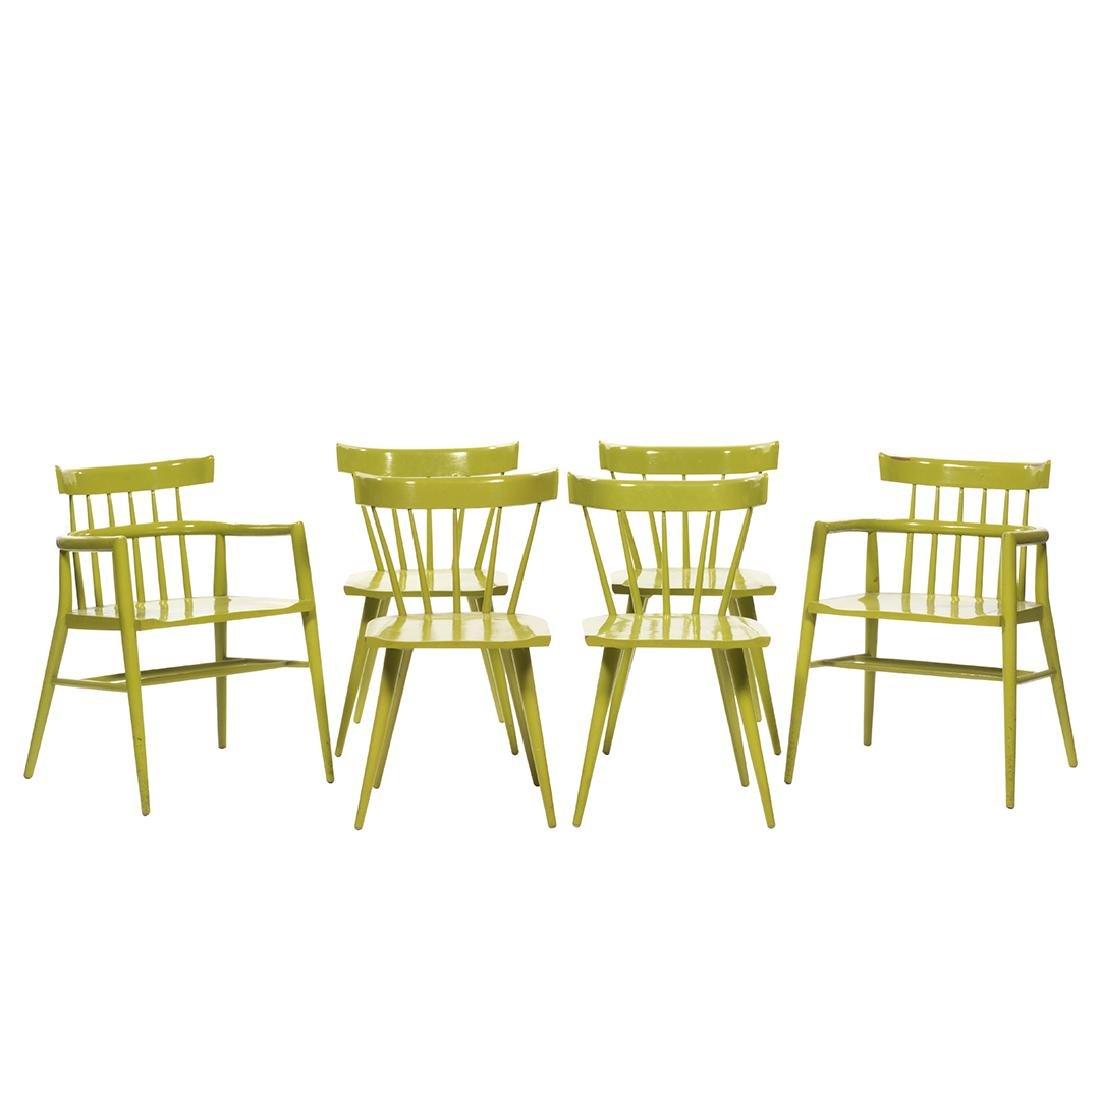 Paul McCobb Dining Chairs (6)